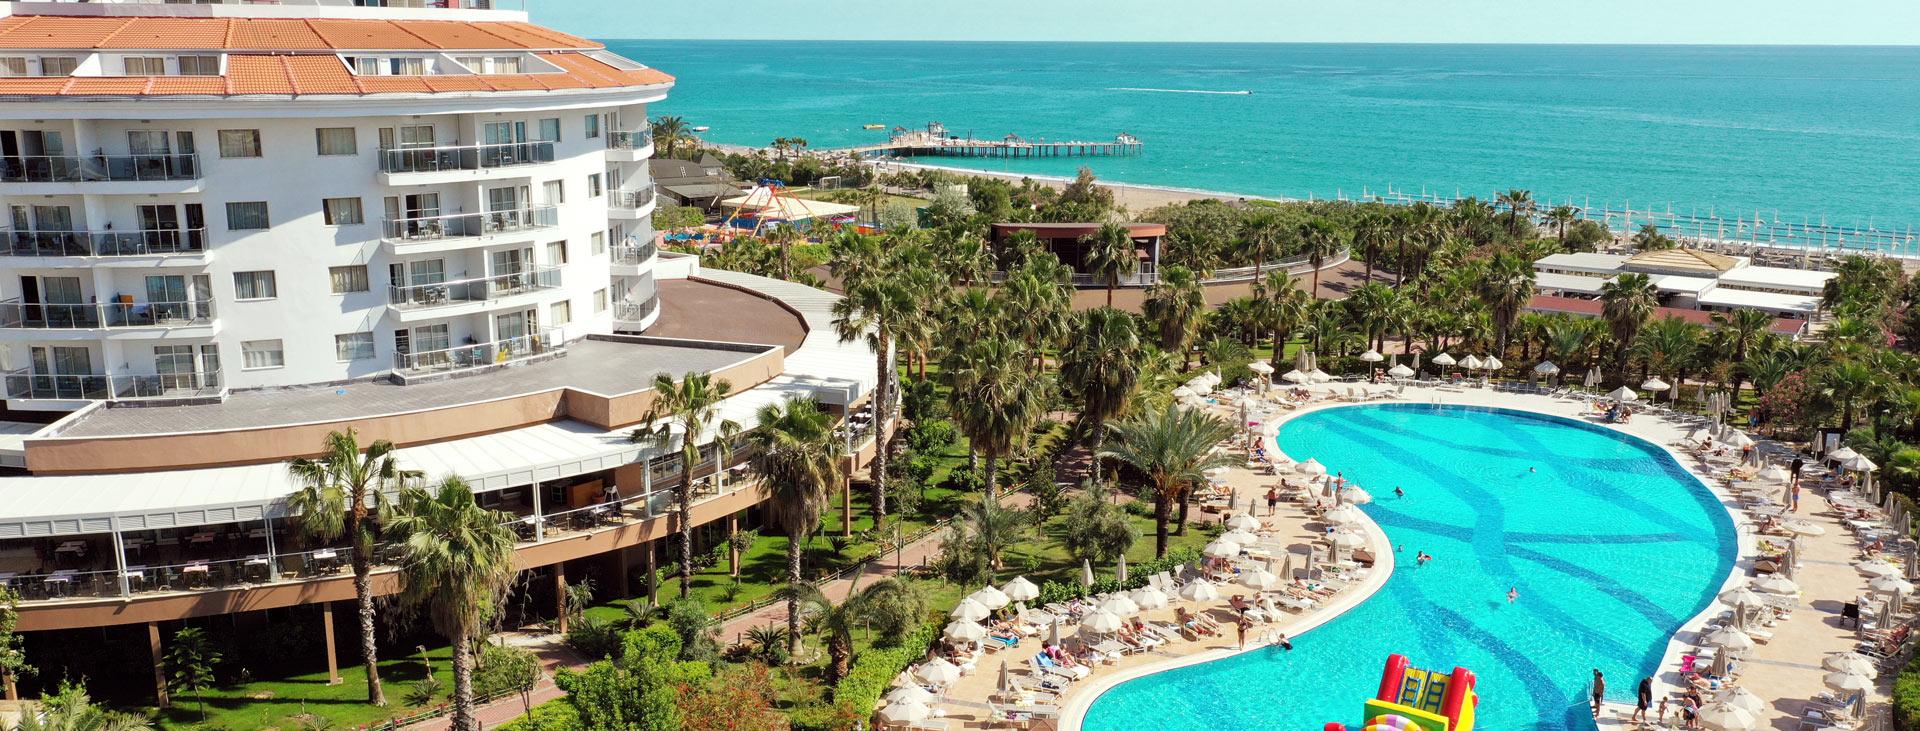 SunConnect Sea World Resort & Spa, Side, Antalya-området, Turkiet